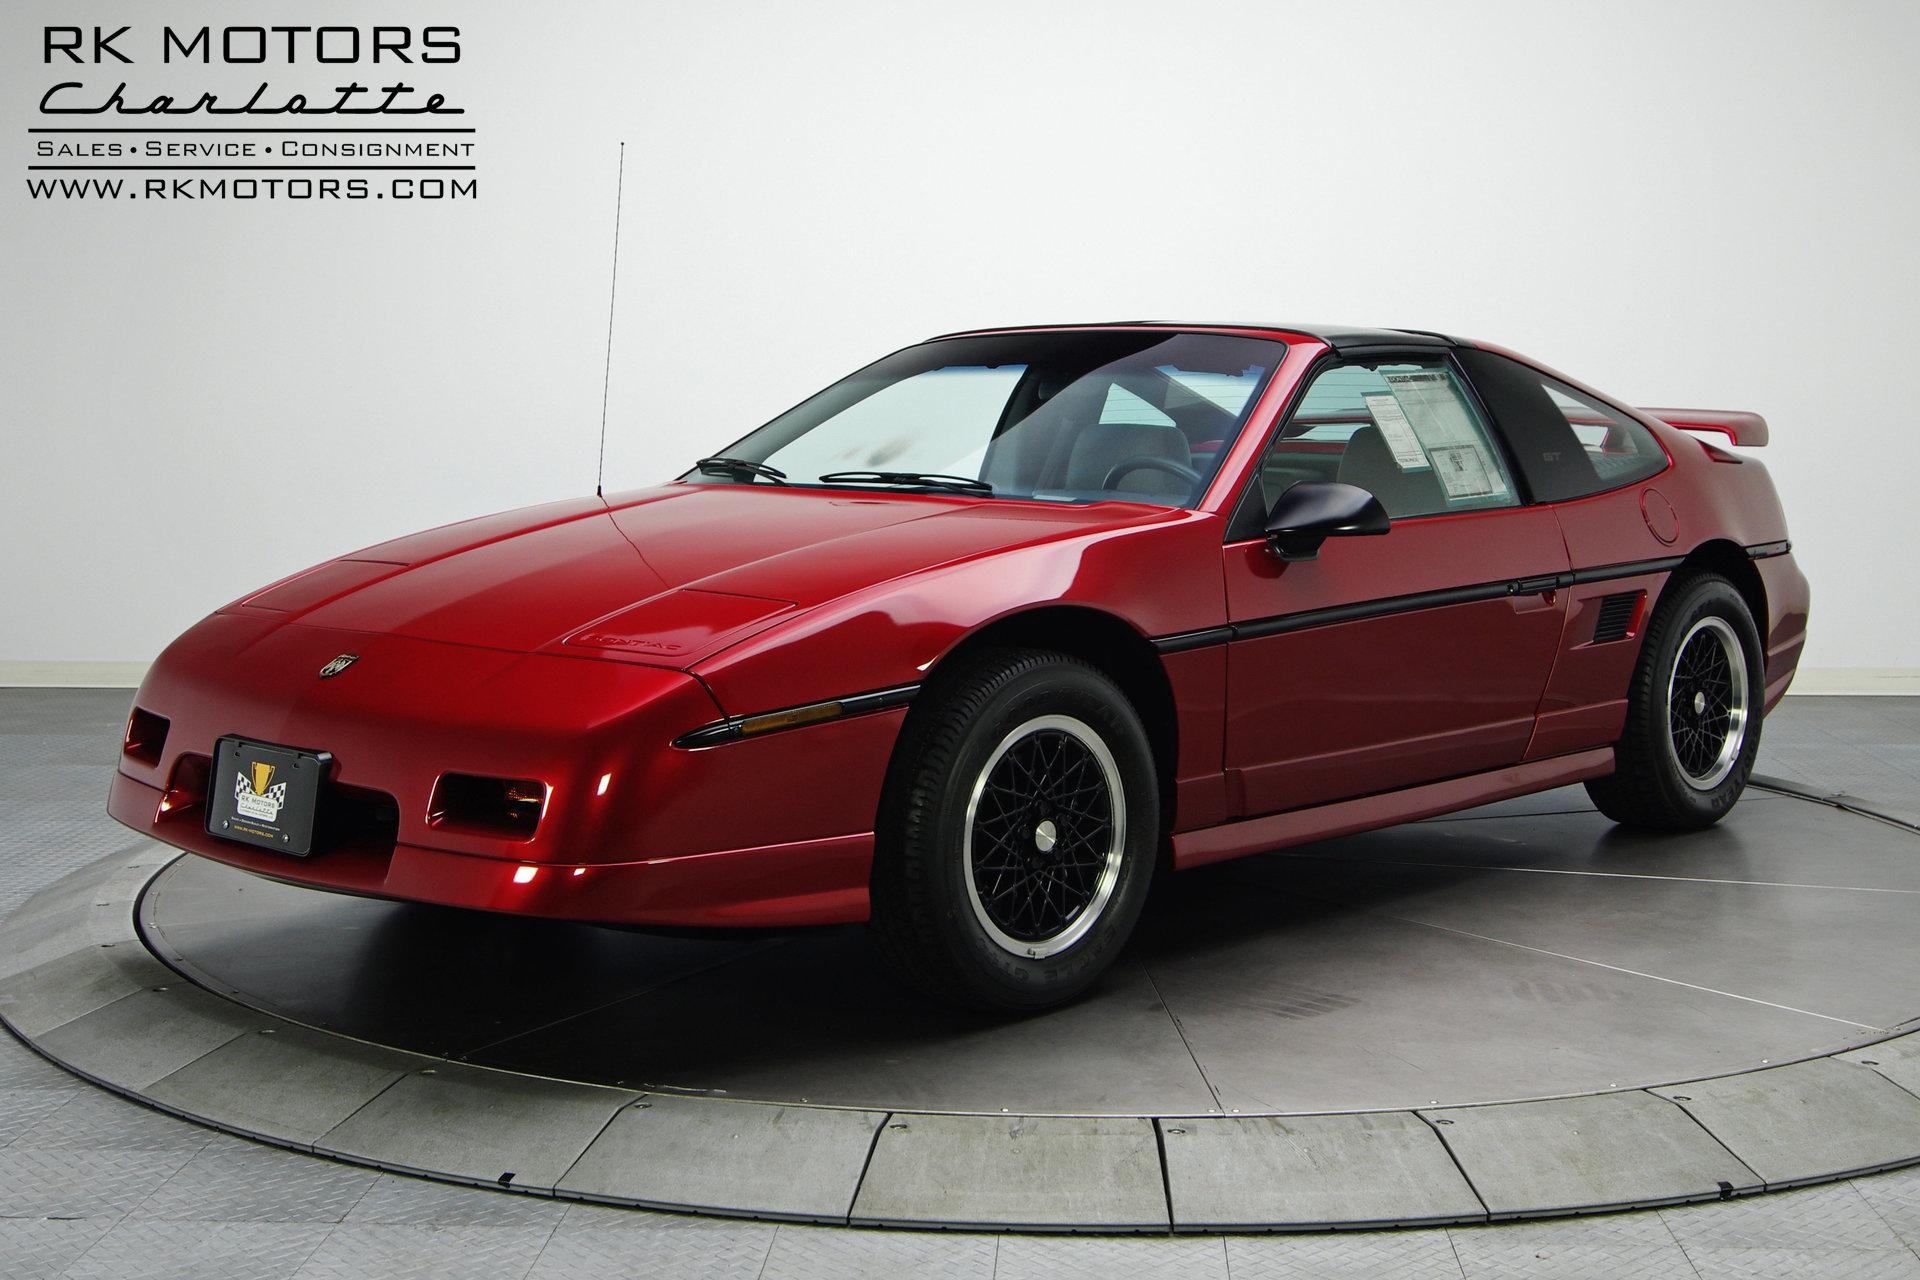 132778 1988 Pontiac Fiero Rk Motors Classic Cars For Sale Console